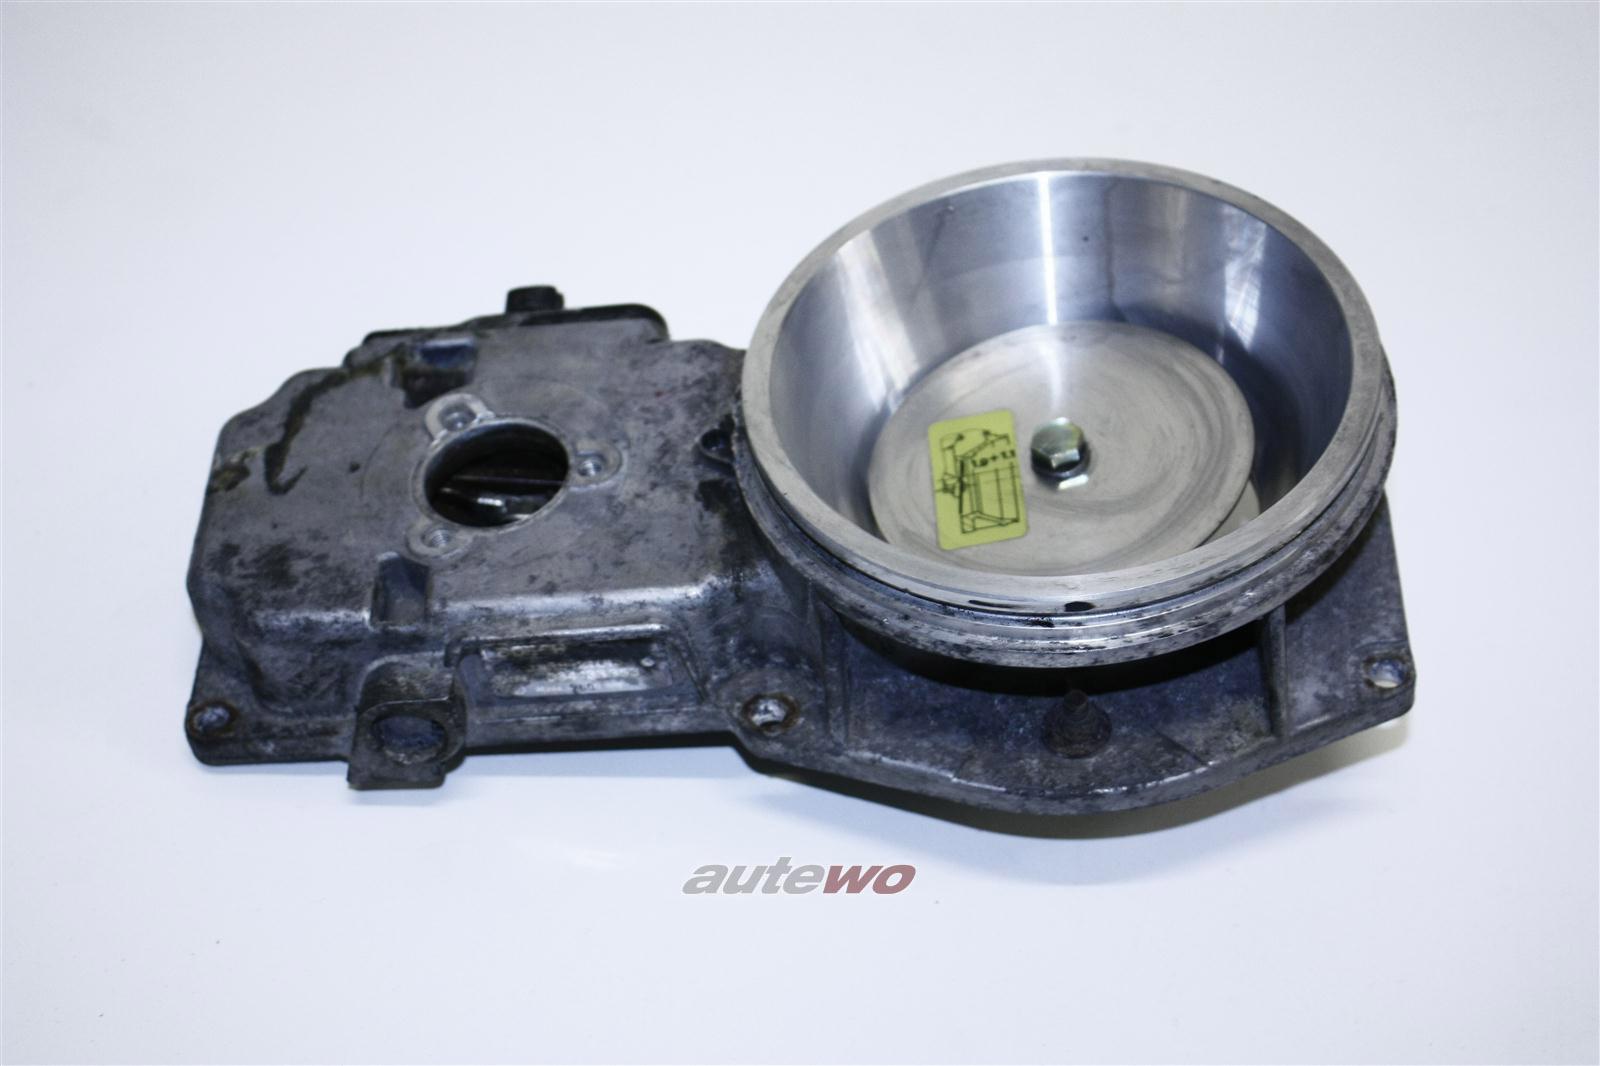 Audi 80/90 Typ 81/85/100 Typ 44 2.0-2.2l Luftmengenmesser 034133353 034133353